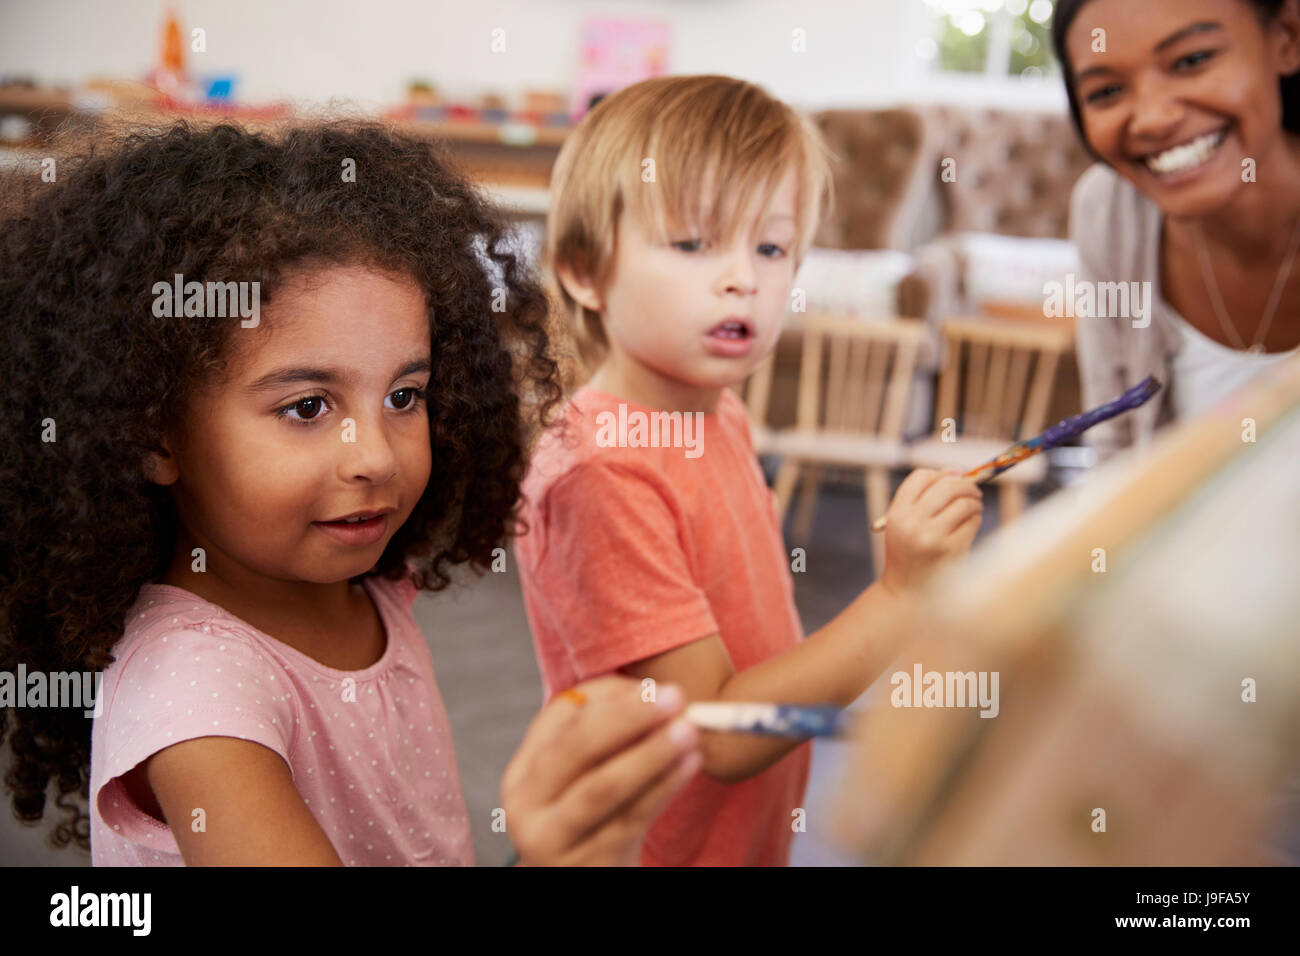 Teacher At Montessori School Helping Children in Art Class - Stock Image